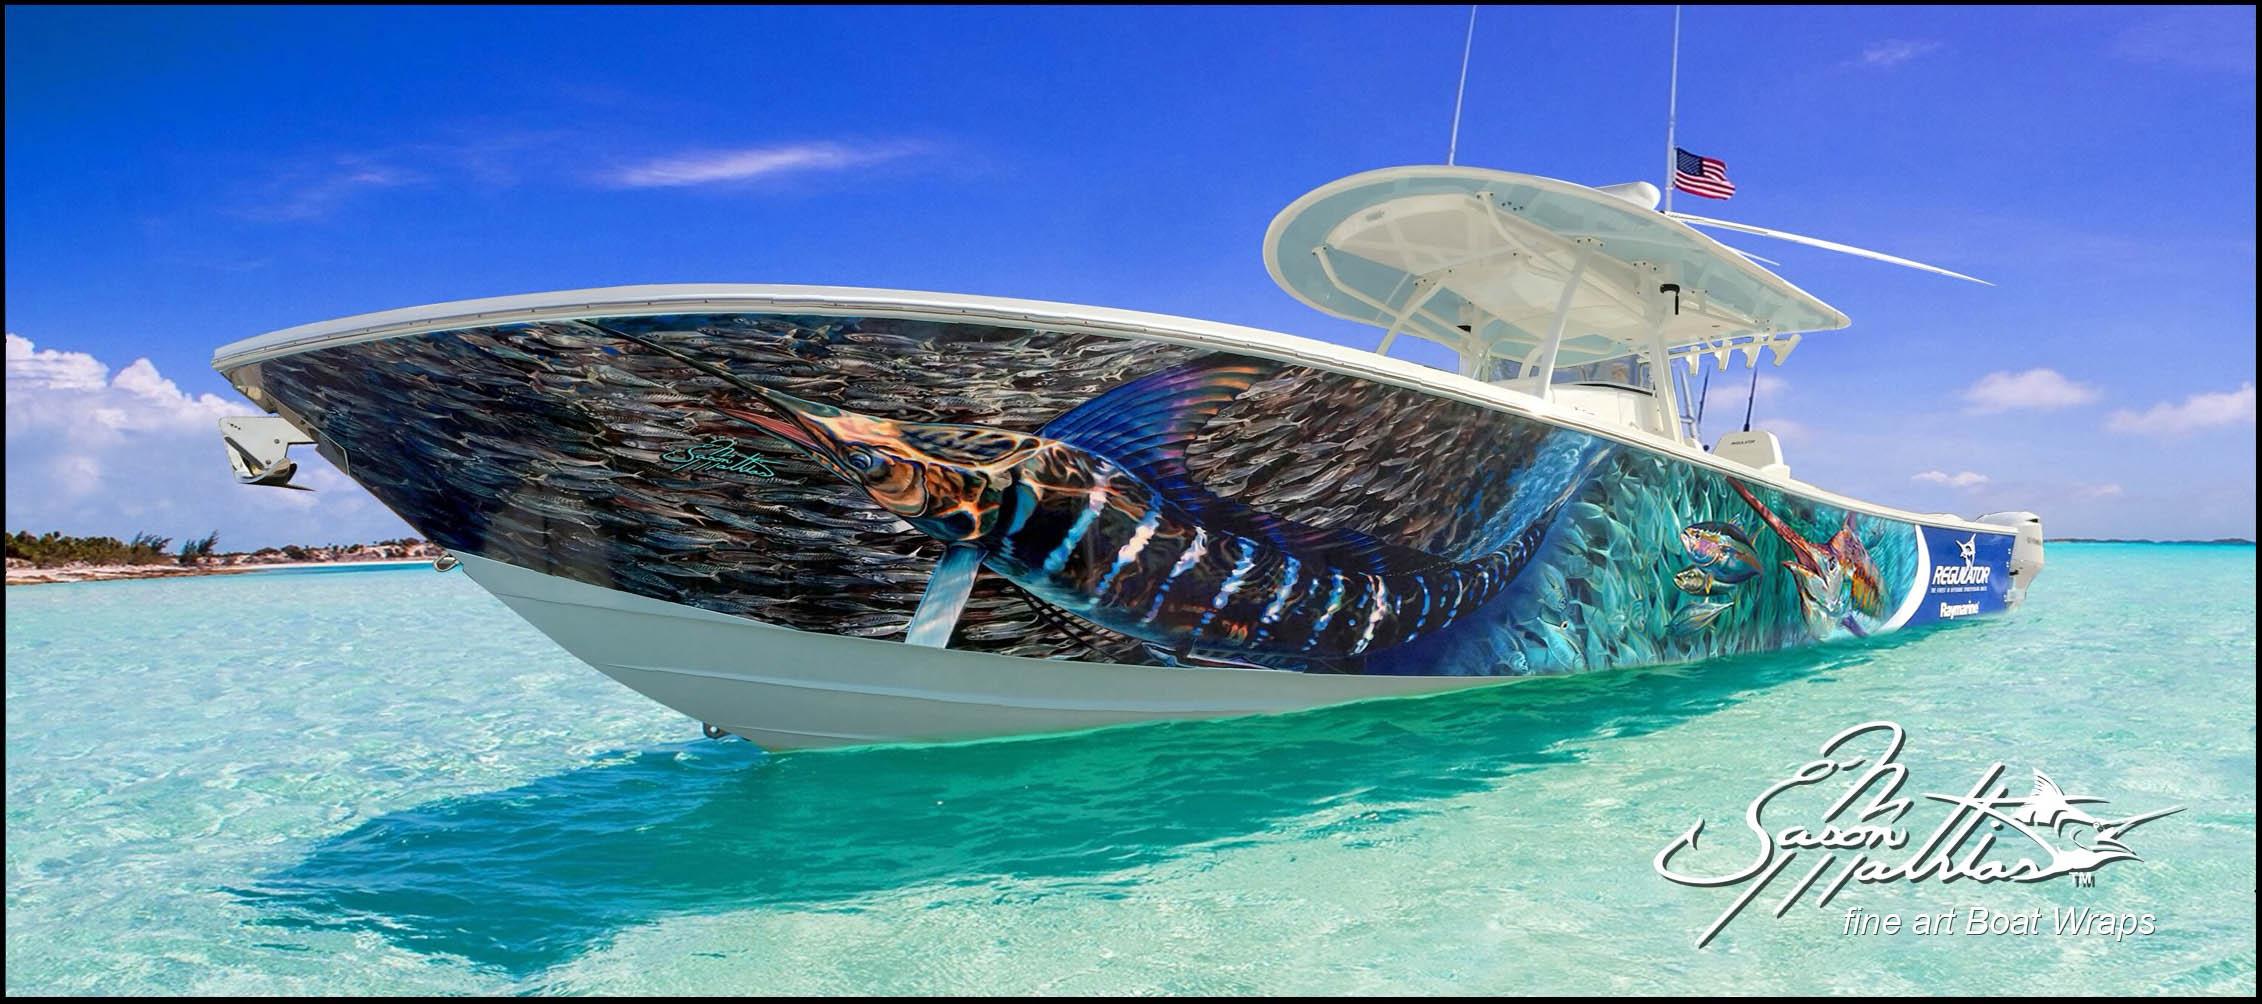 boat-wraps-boat-wrap-desings-marlin-art-jason-mathias-sportfish-fihsing-gamefish-standard-designs.jpg.jpg